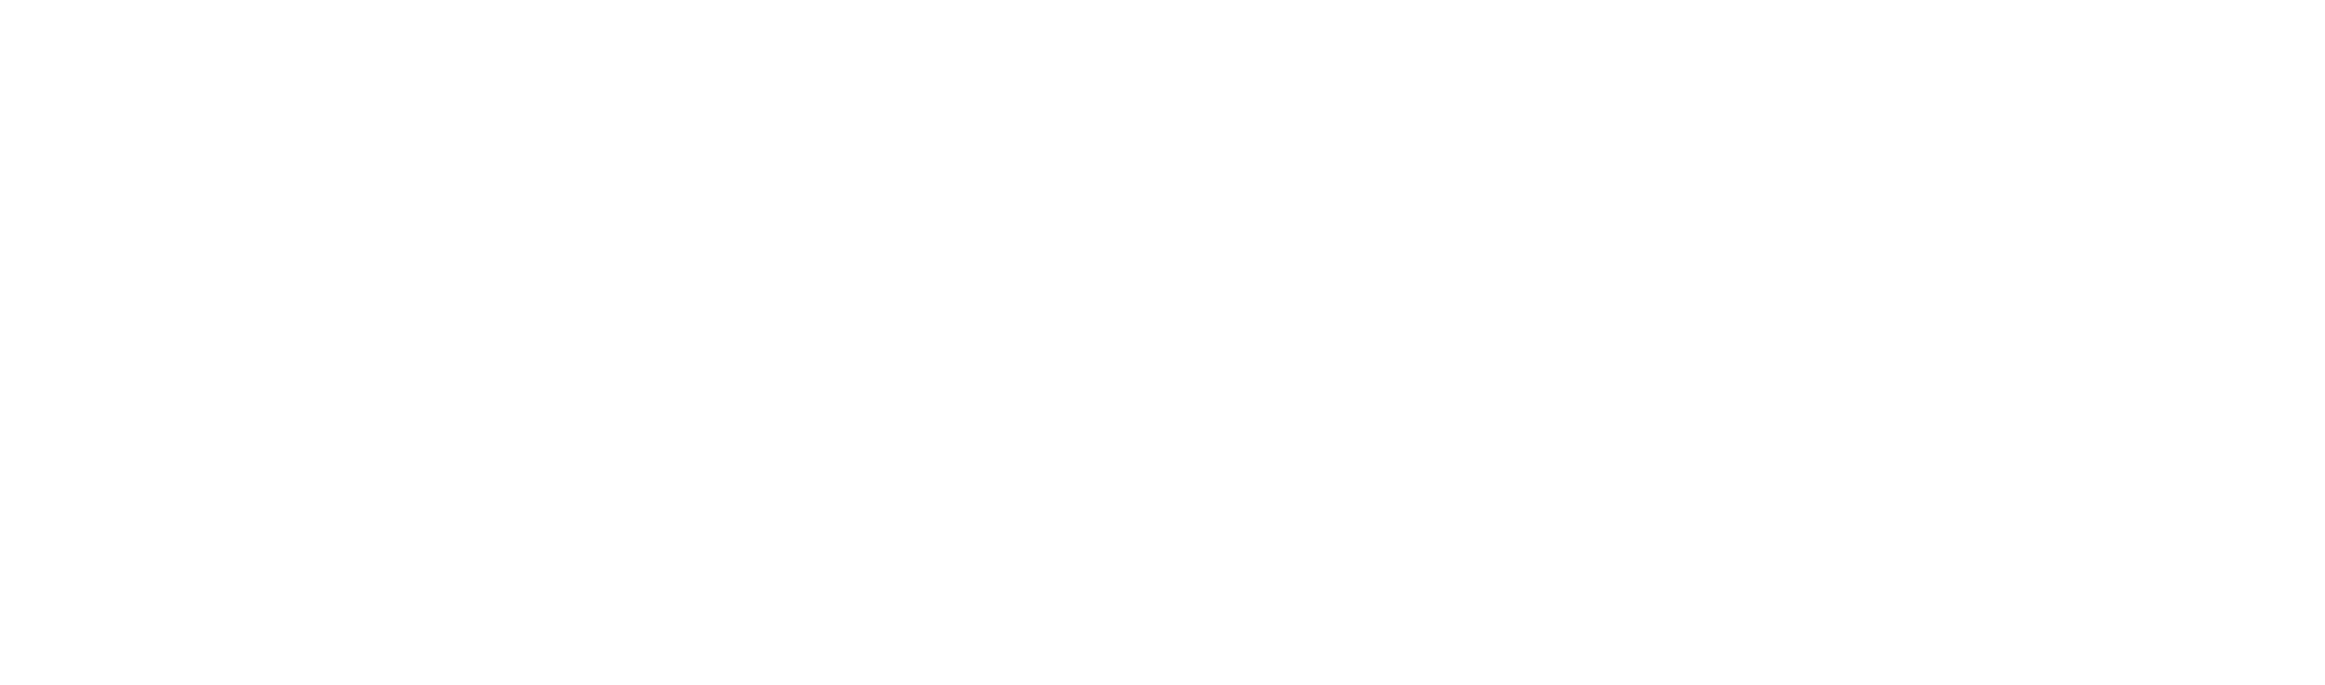 logo-stacked-white-eye-011